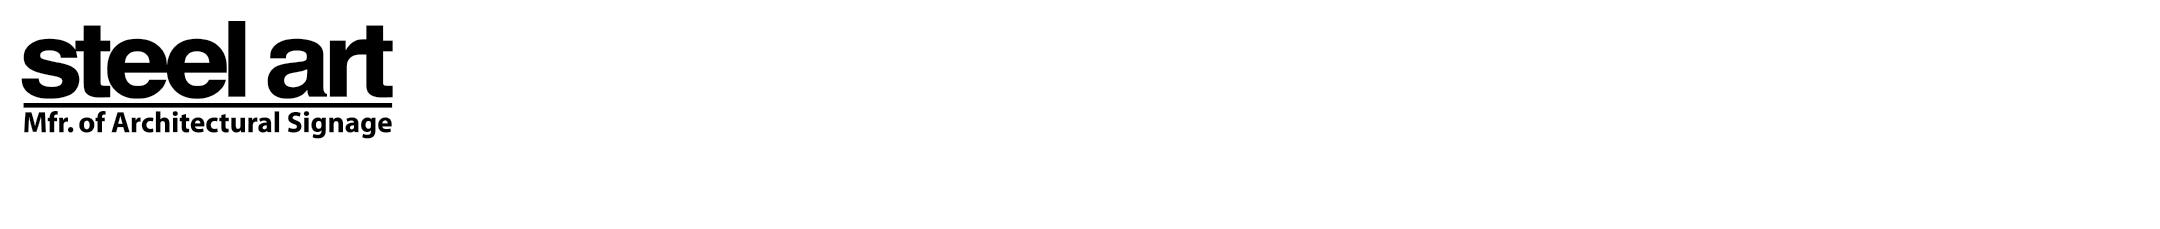 steelart logo